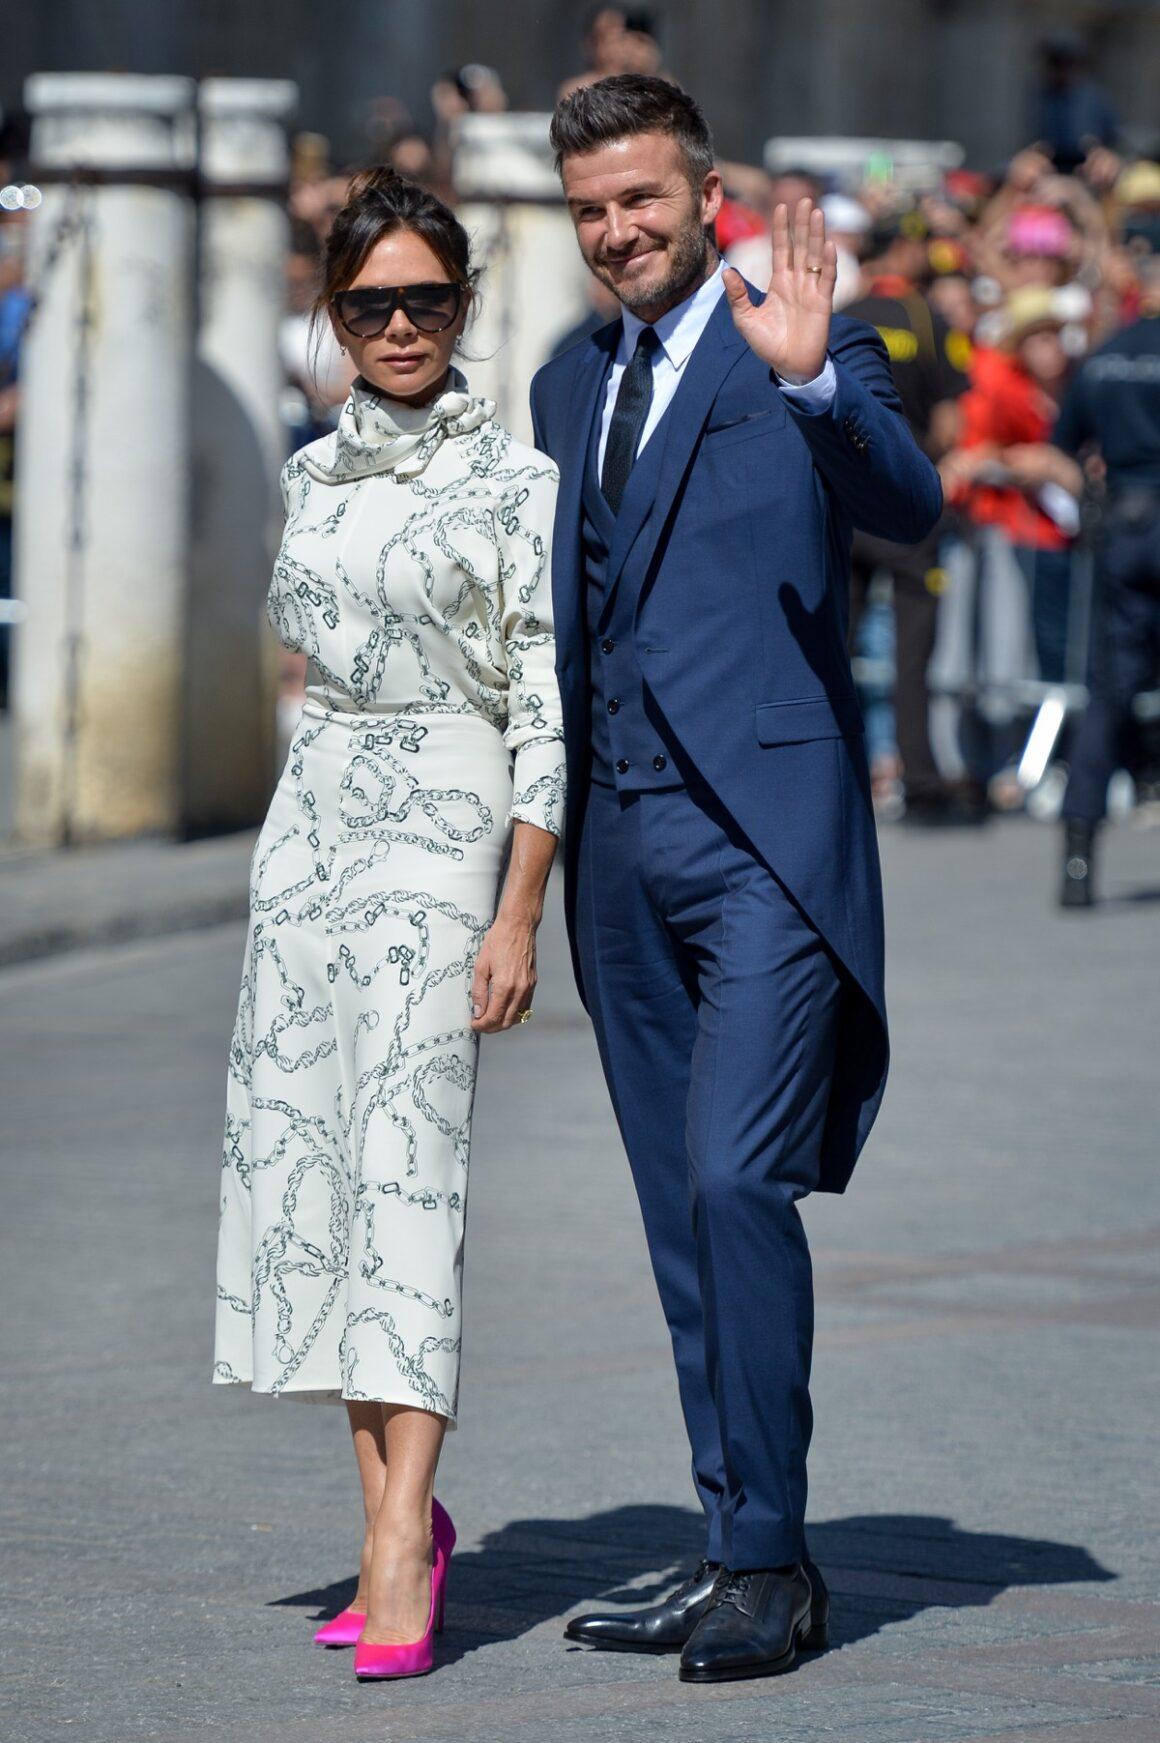 David Beckham and Victoria Beckham Sergio Ramos And Pilar Rubio Wedding In Seville